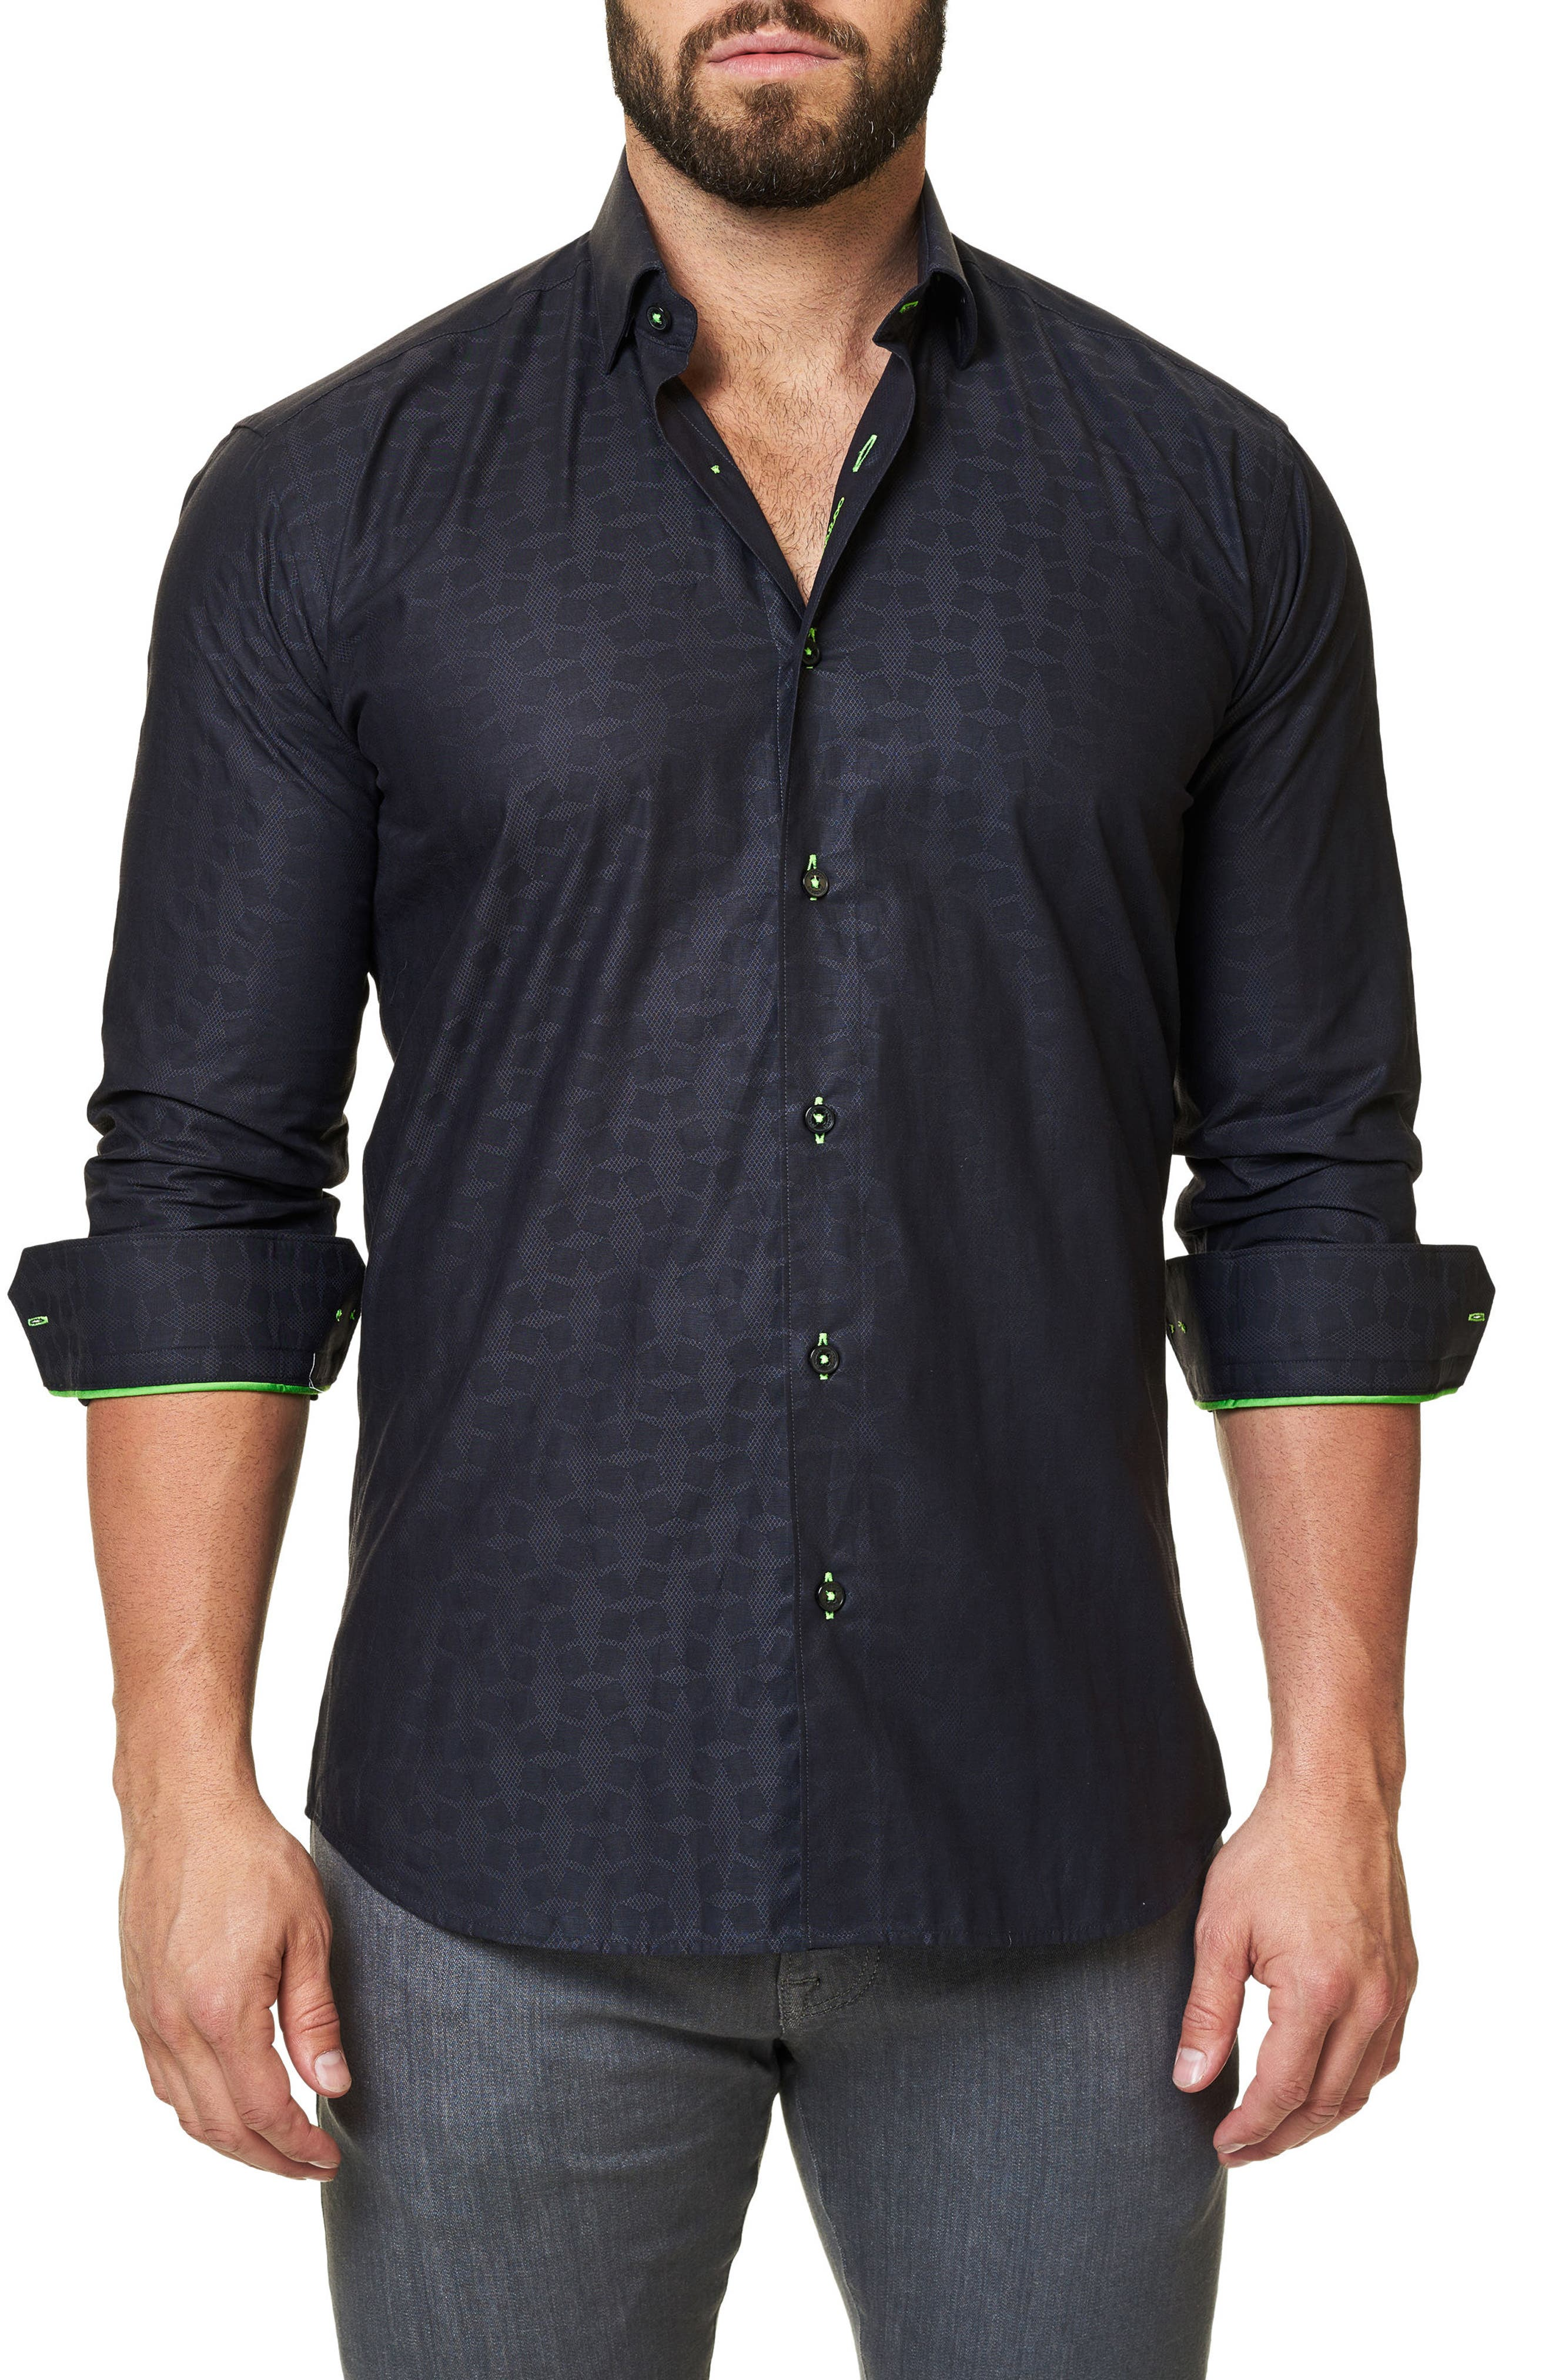 Alternate Image 1 Selected - Maceoo Trim Fit Print Sport Shirt